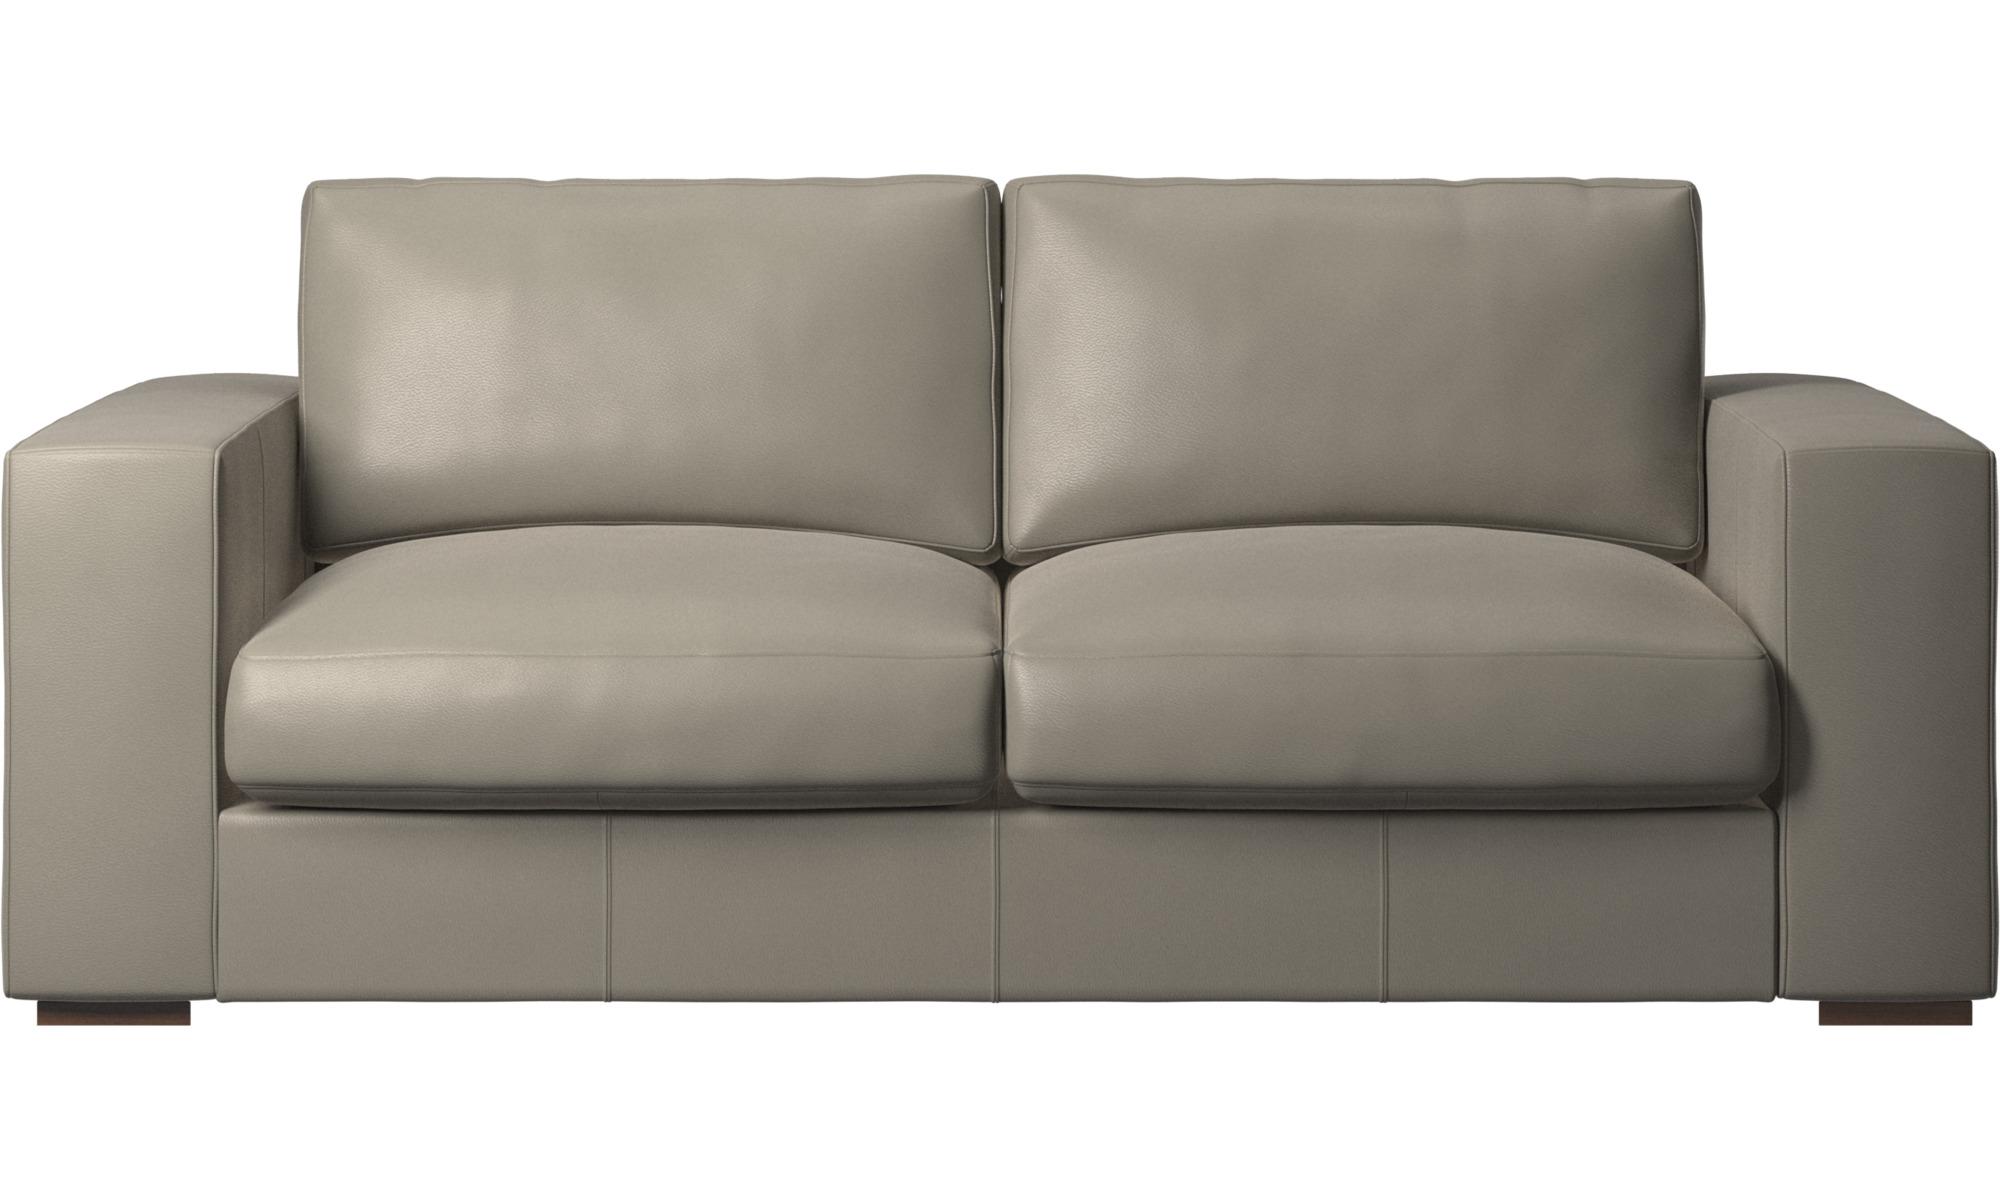 2½ personers sofaer - Cenova sofa - Grå - Læder